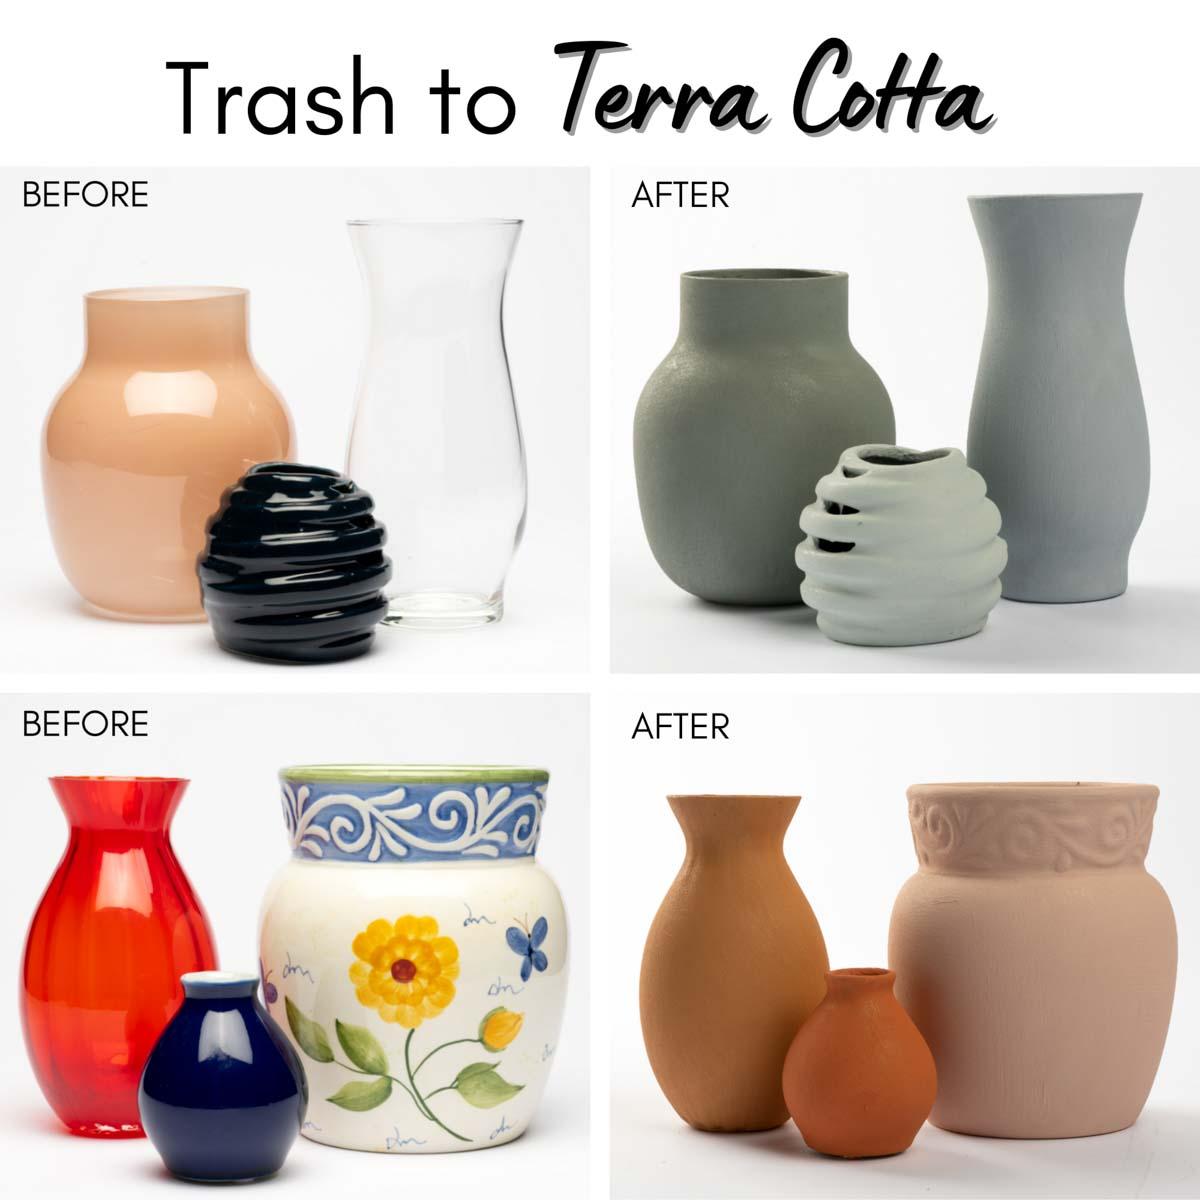 FolkArt ® Terra Cotta™ Acrylic Paint - Fresh Granite, 2 oz. - 7029